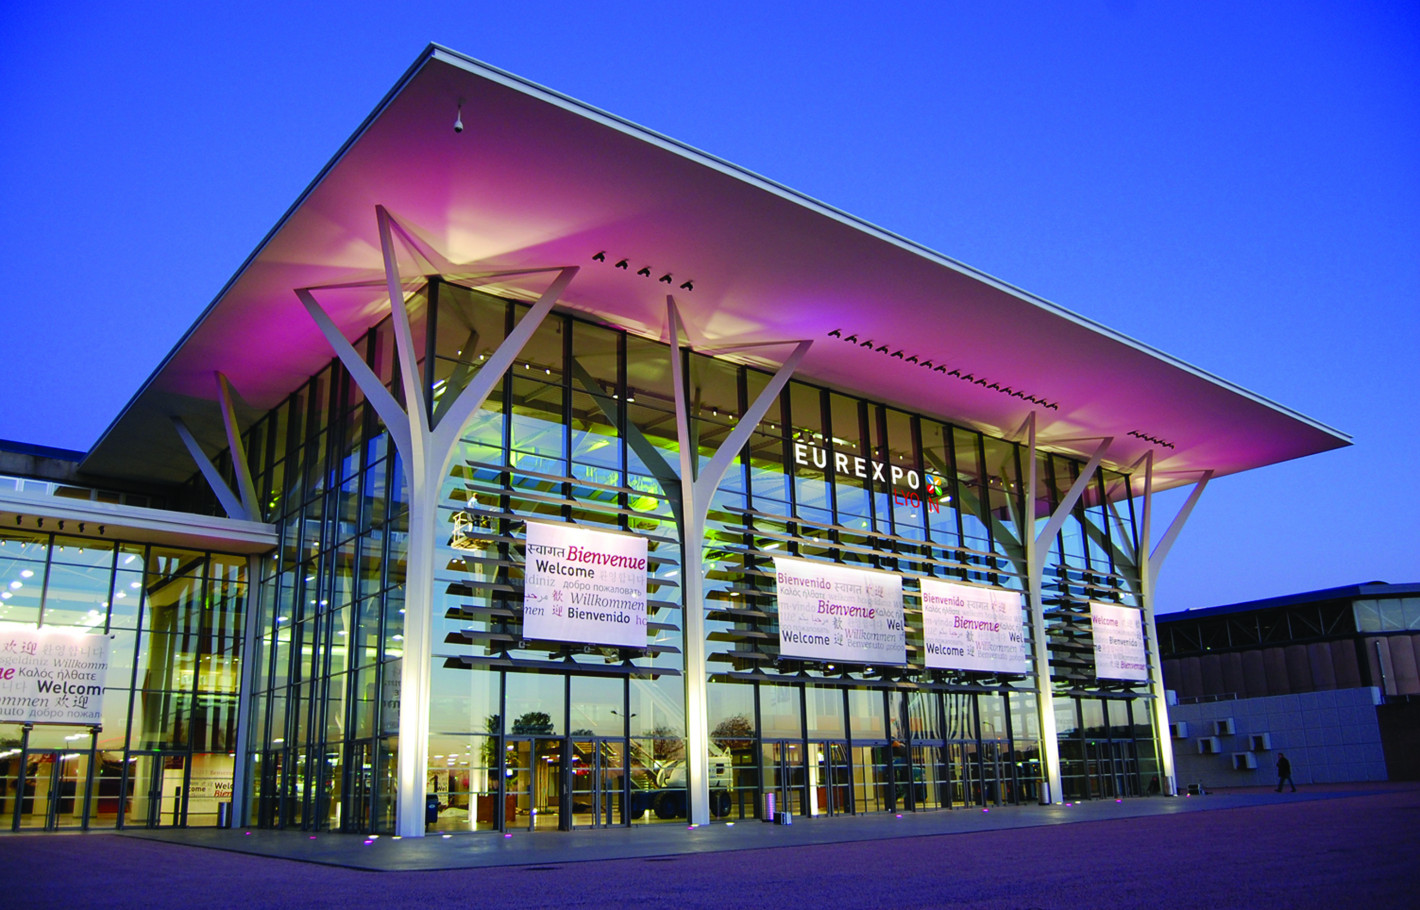 Food Lion Auto Fair 2020.Upcoming Events Eurexpo Lyon